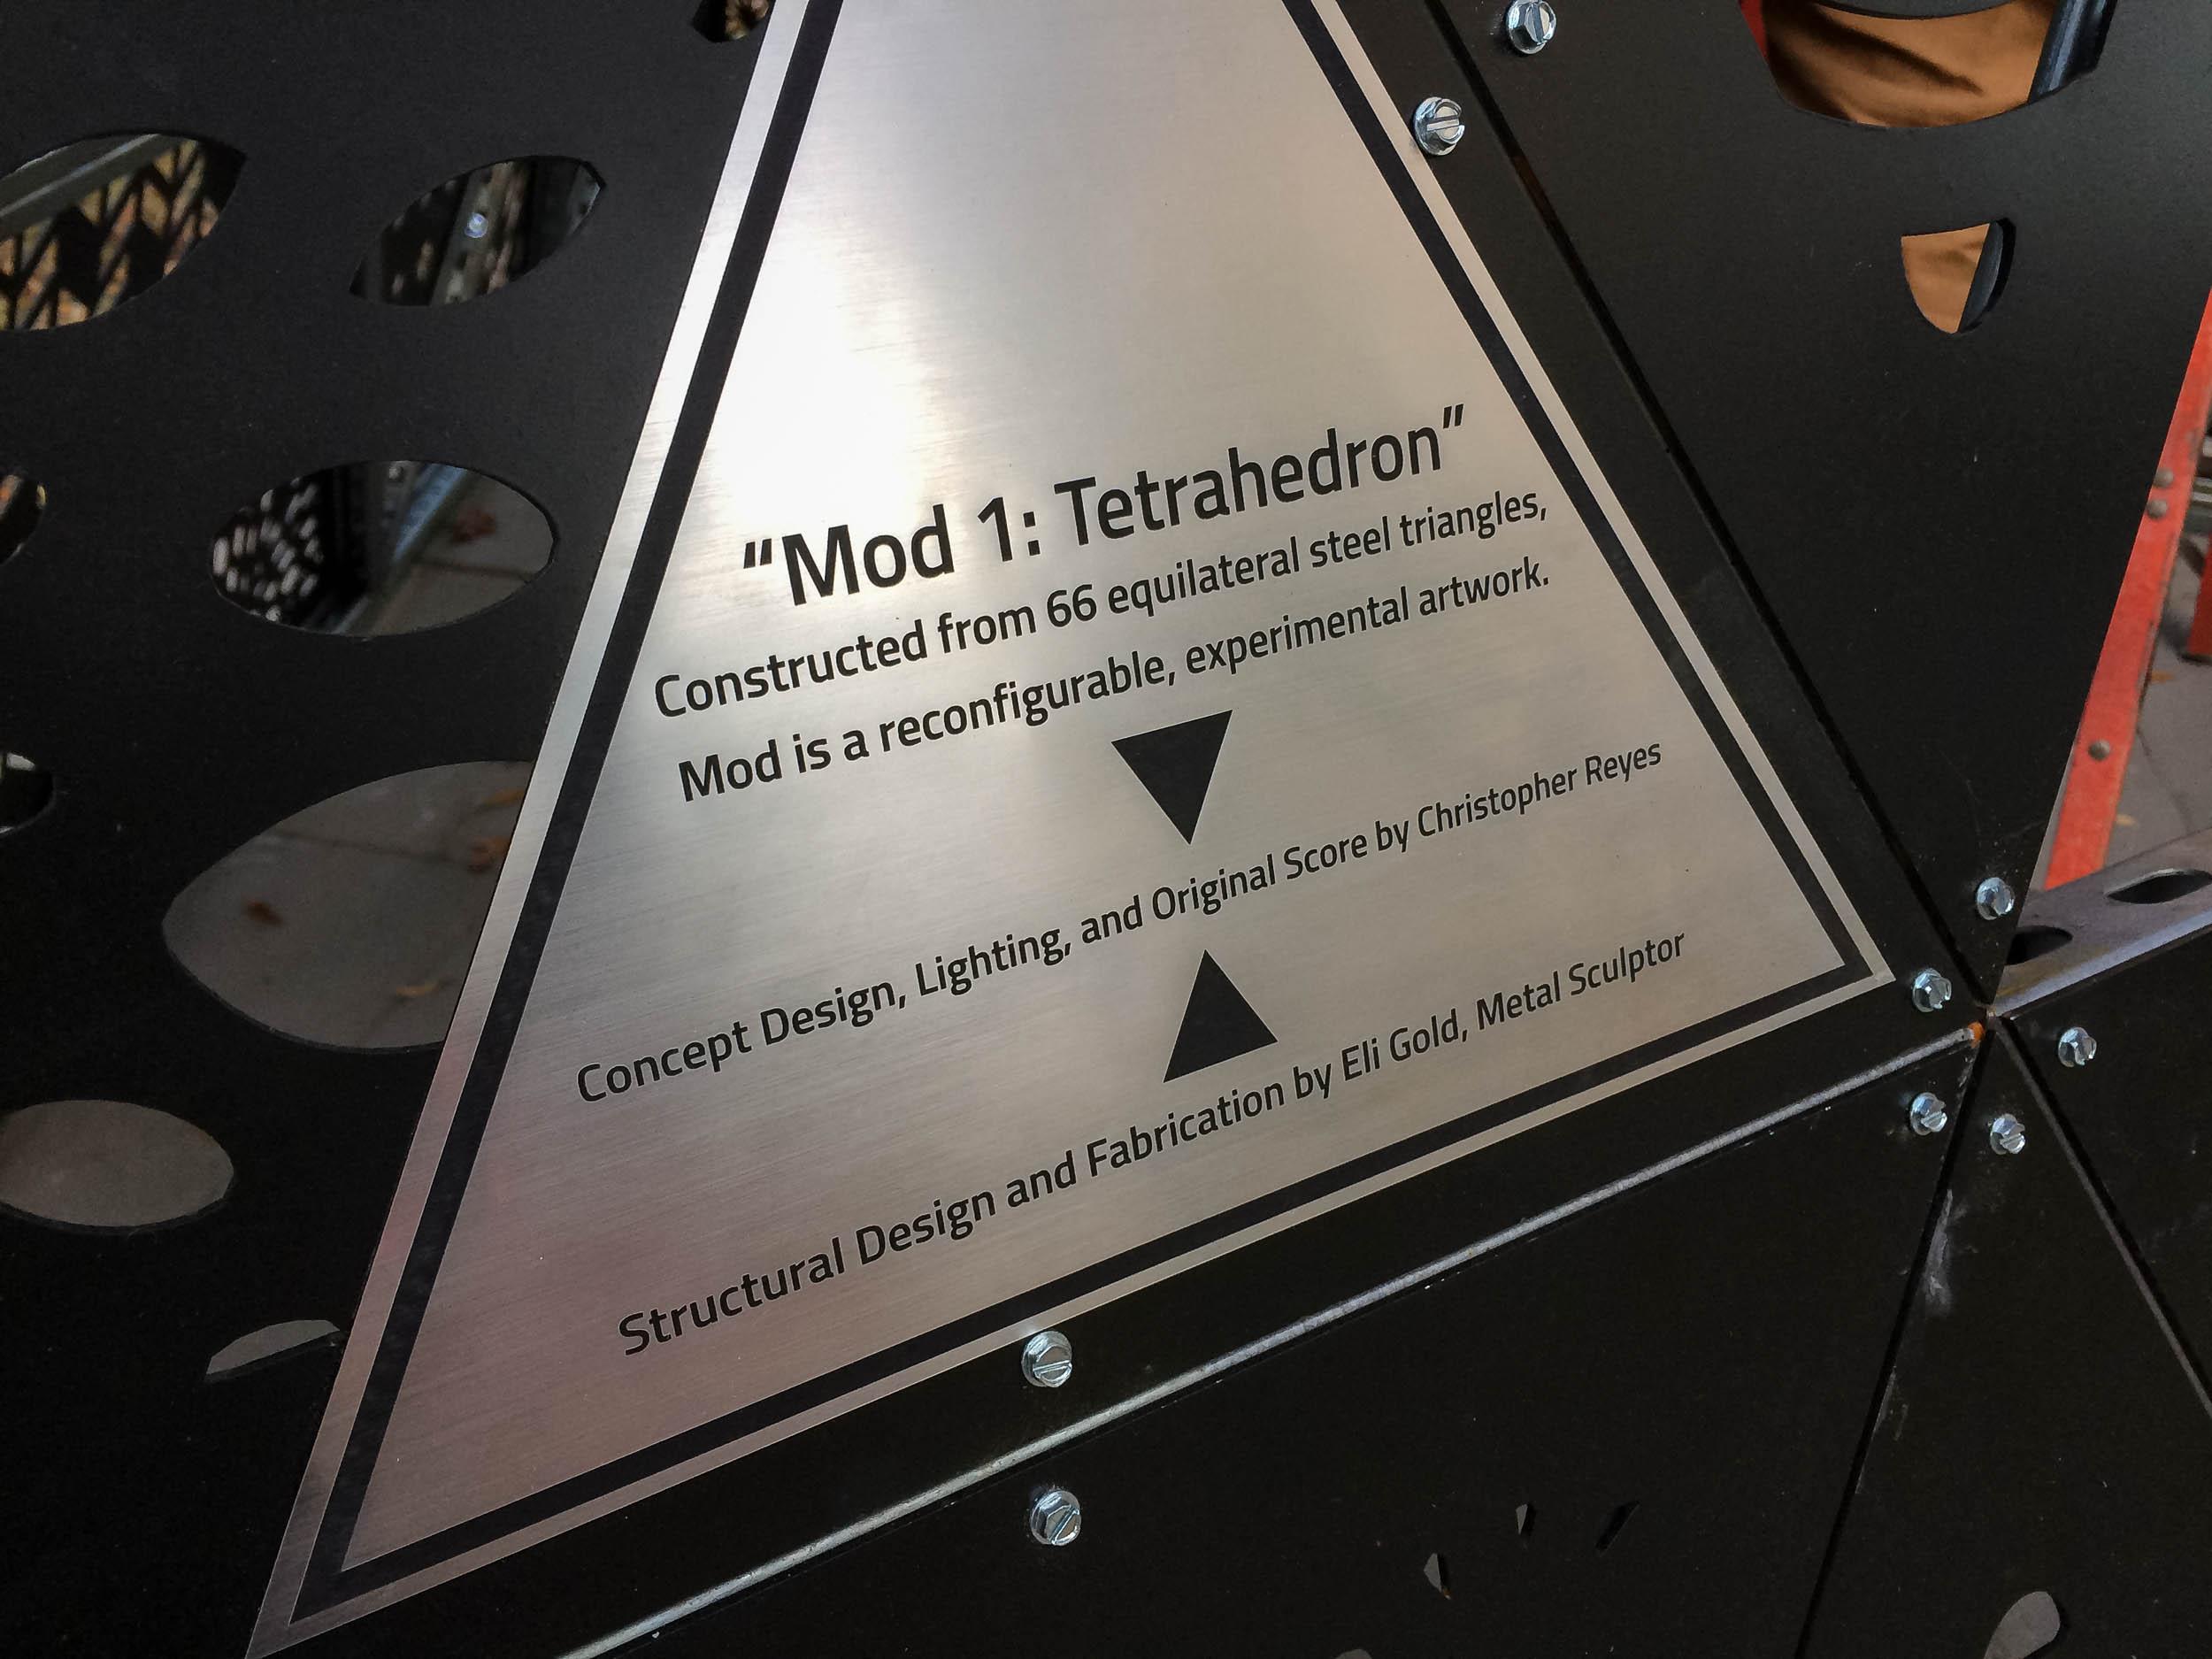 MOD 1 Tetrahedron Downtown Installation 0012.jpg